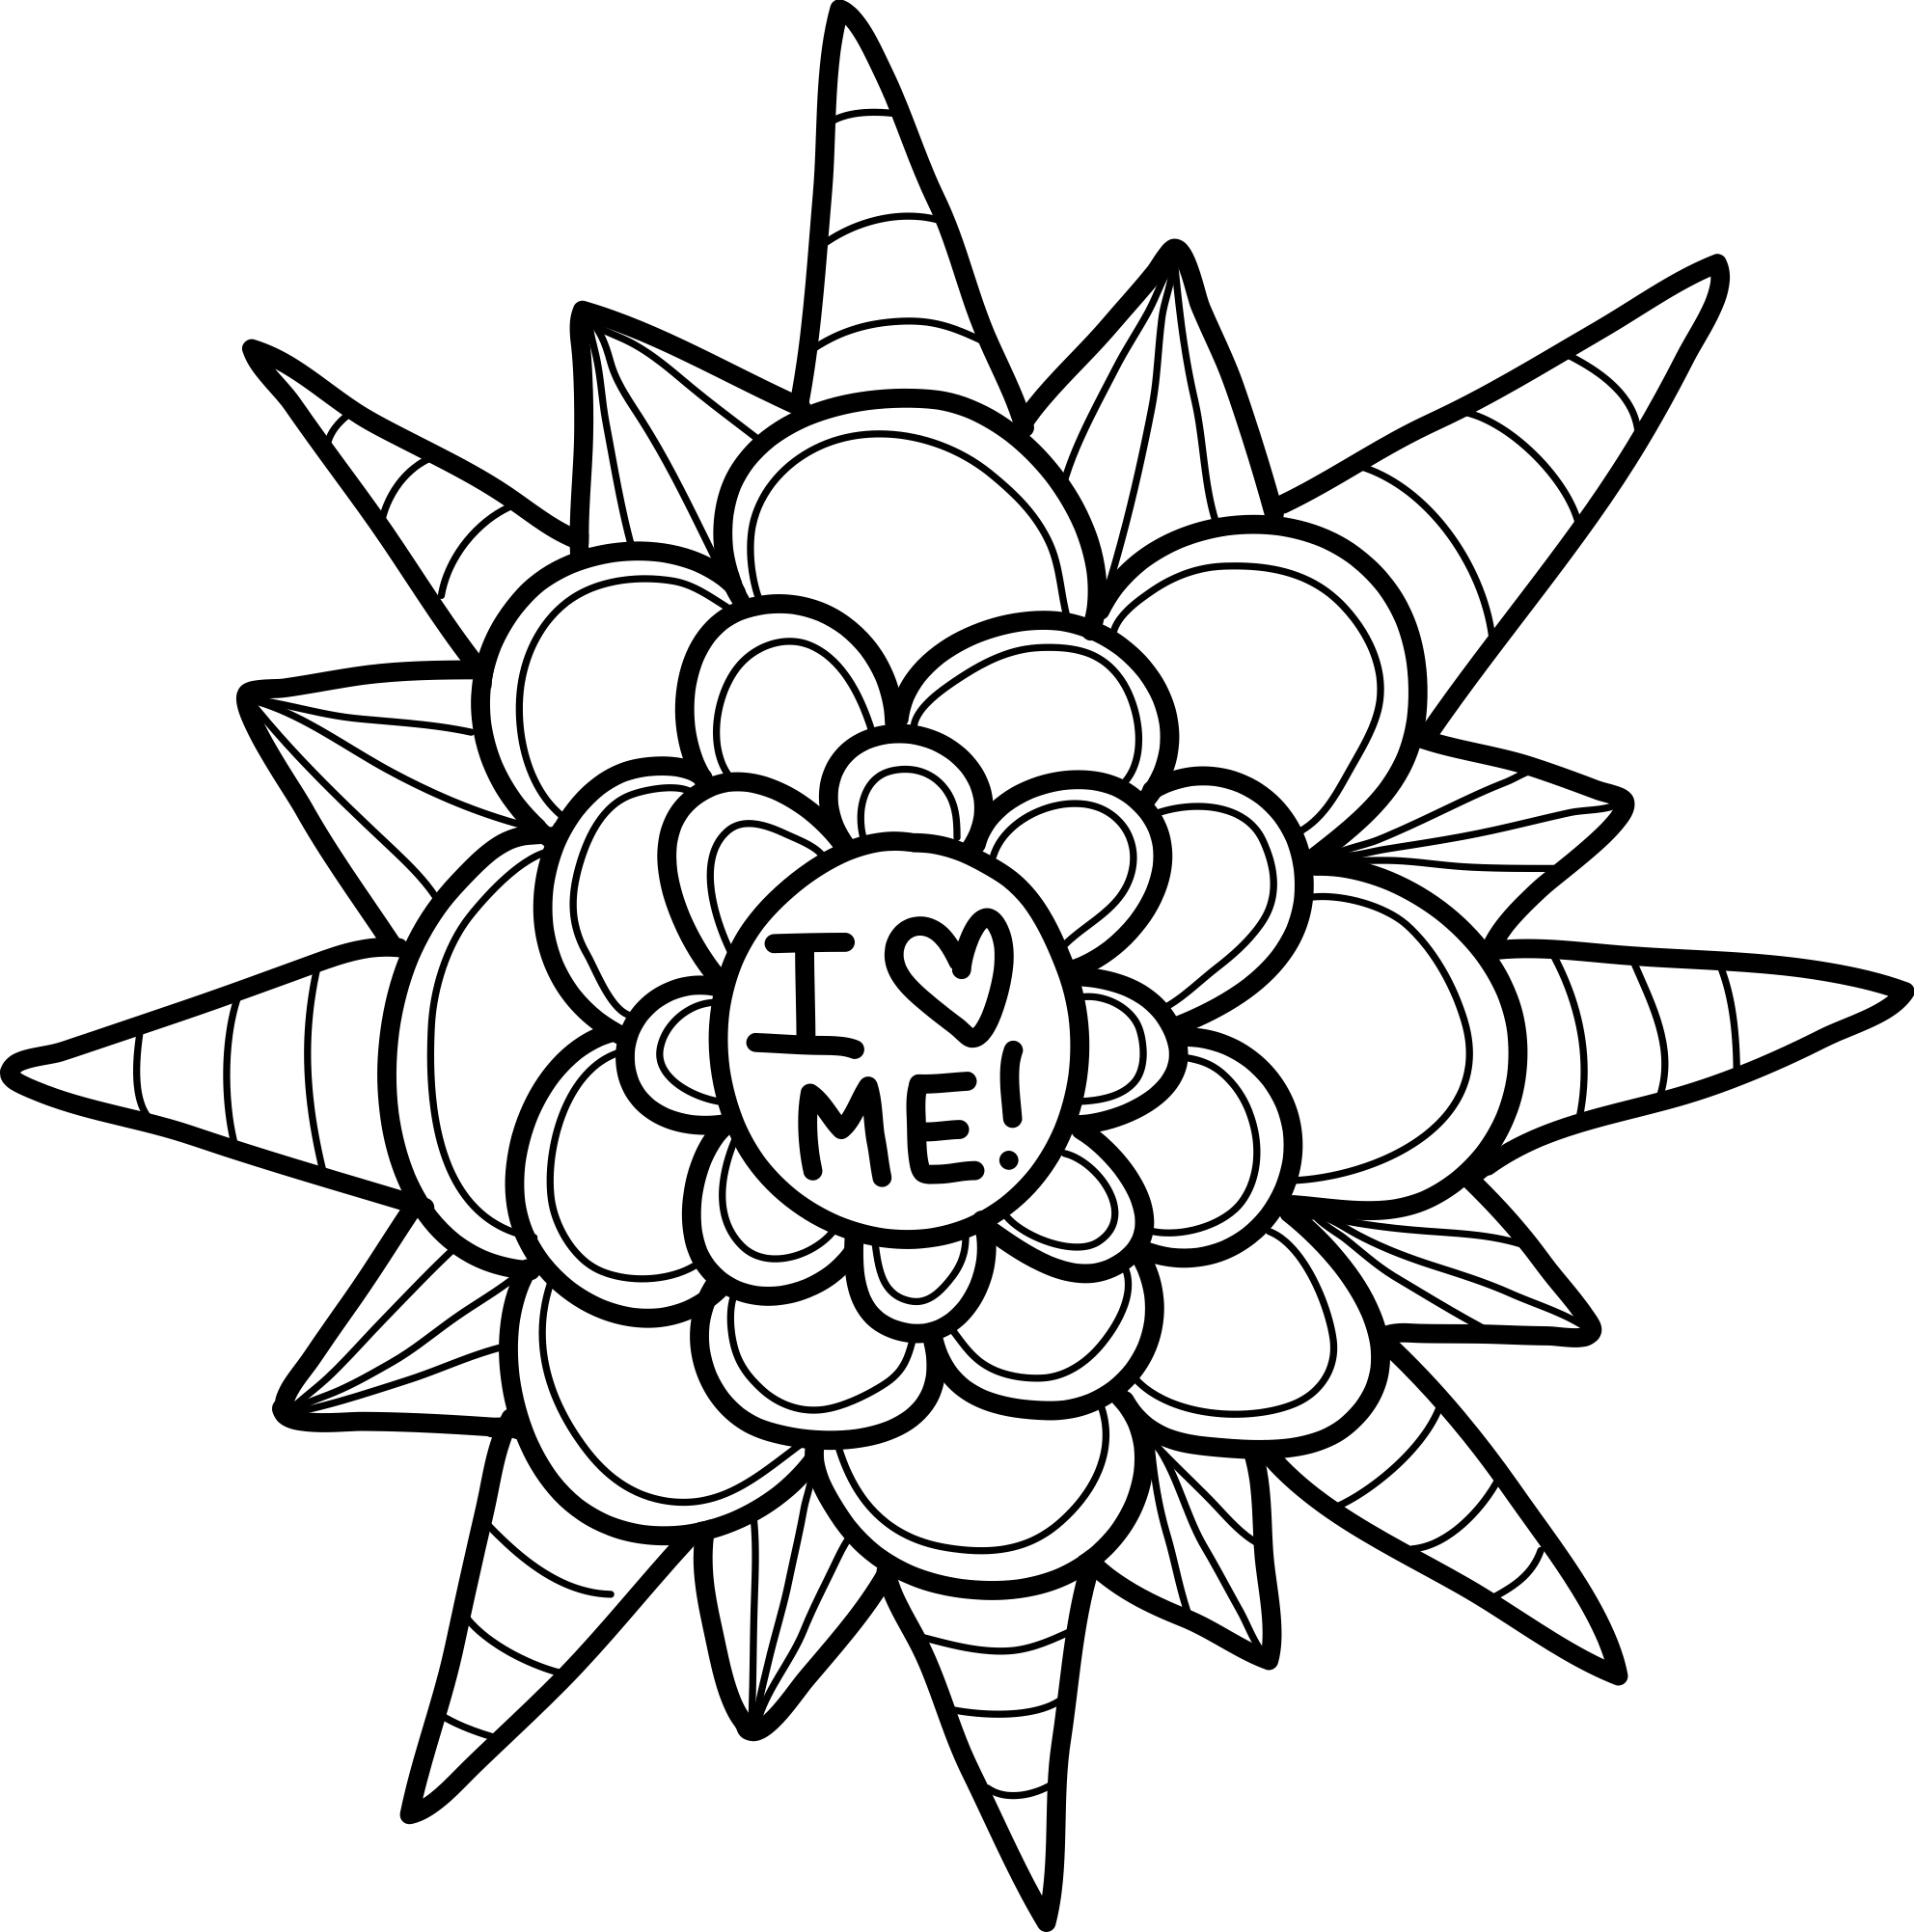 FREE Guided Journal + Mandala Coloring Book for Self-Love ...